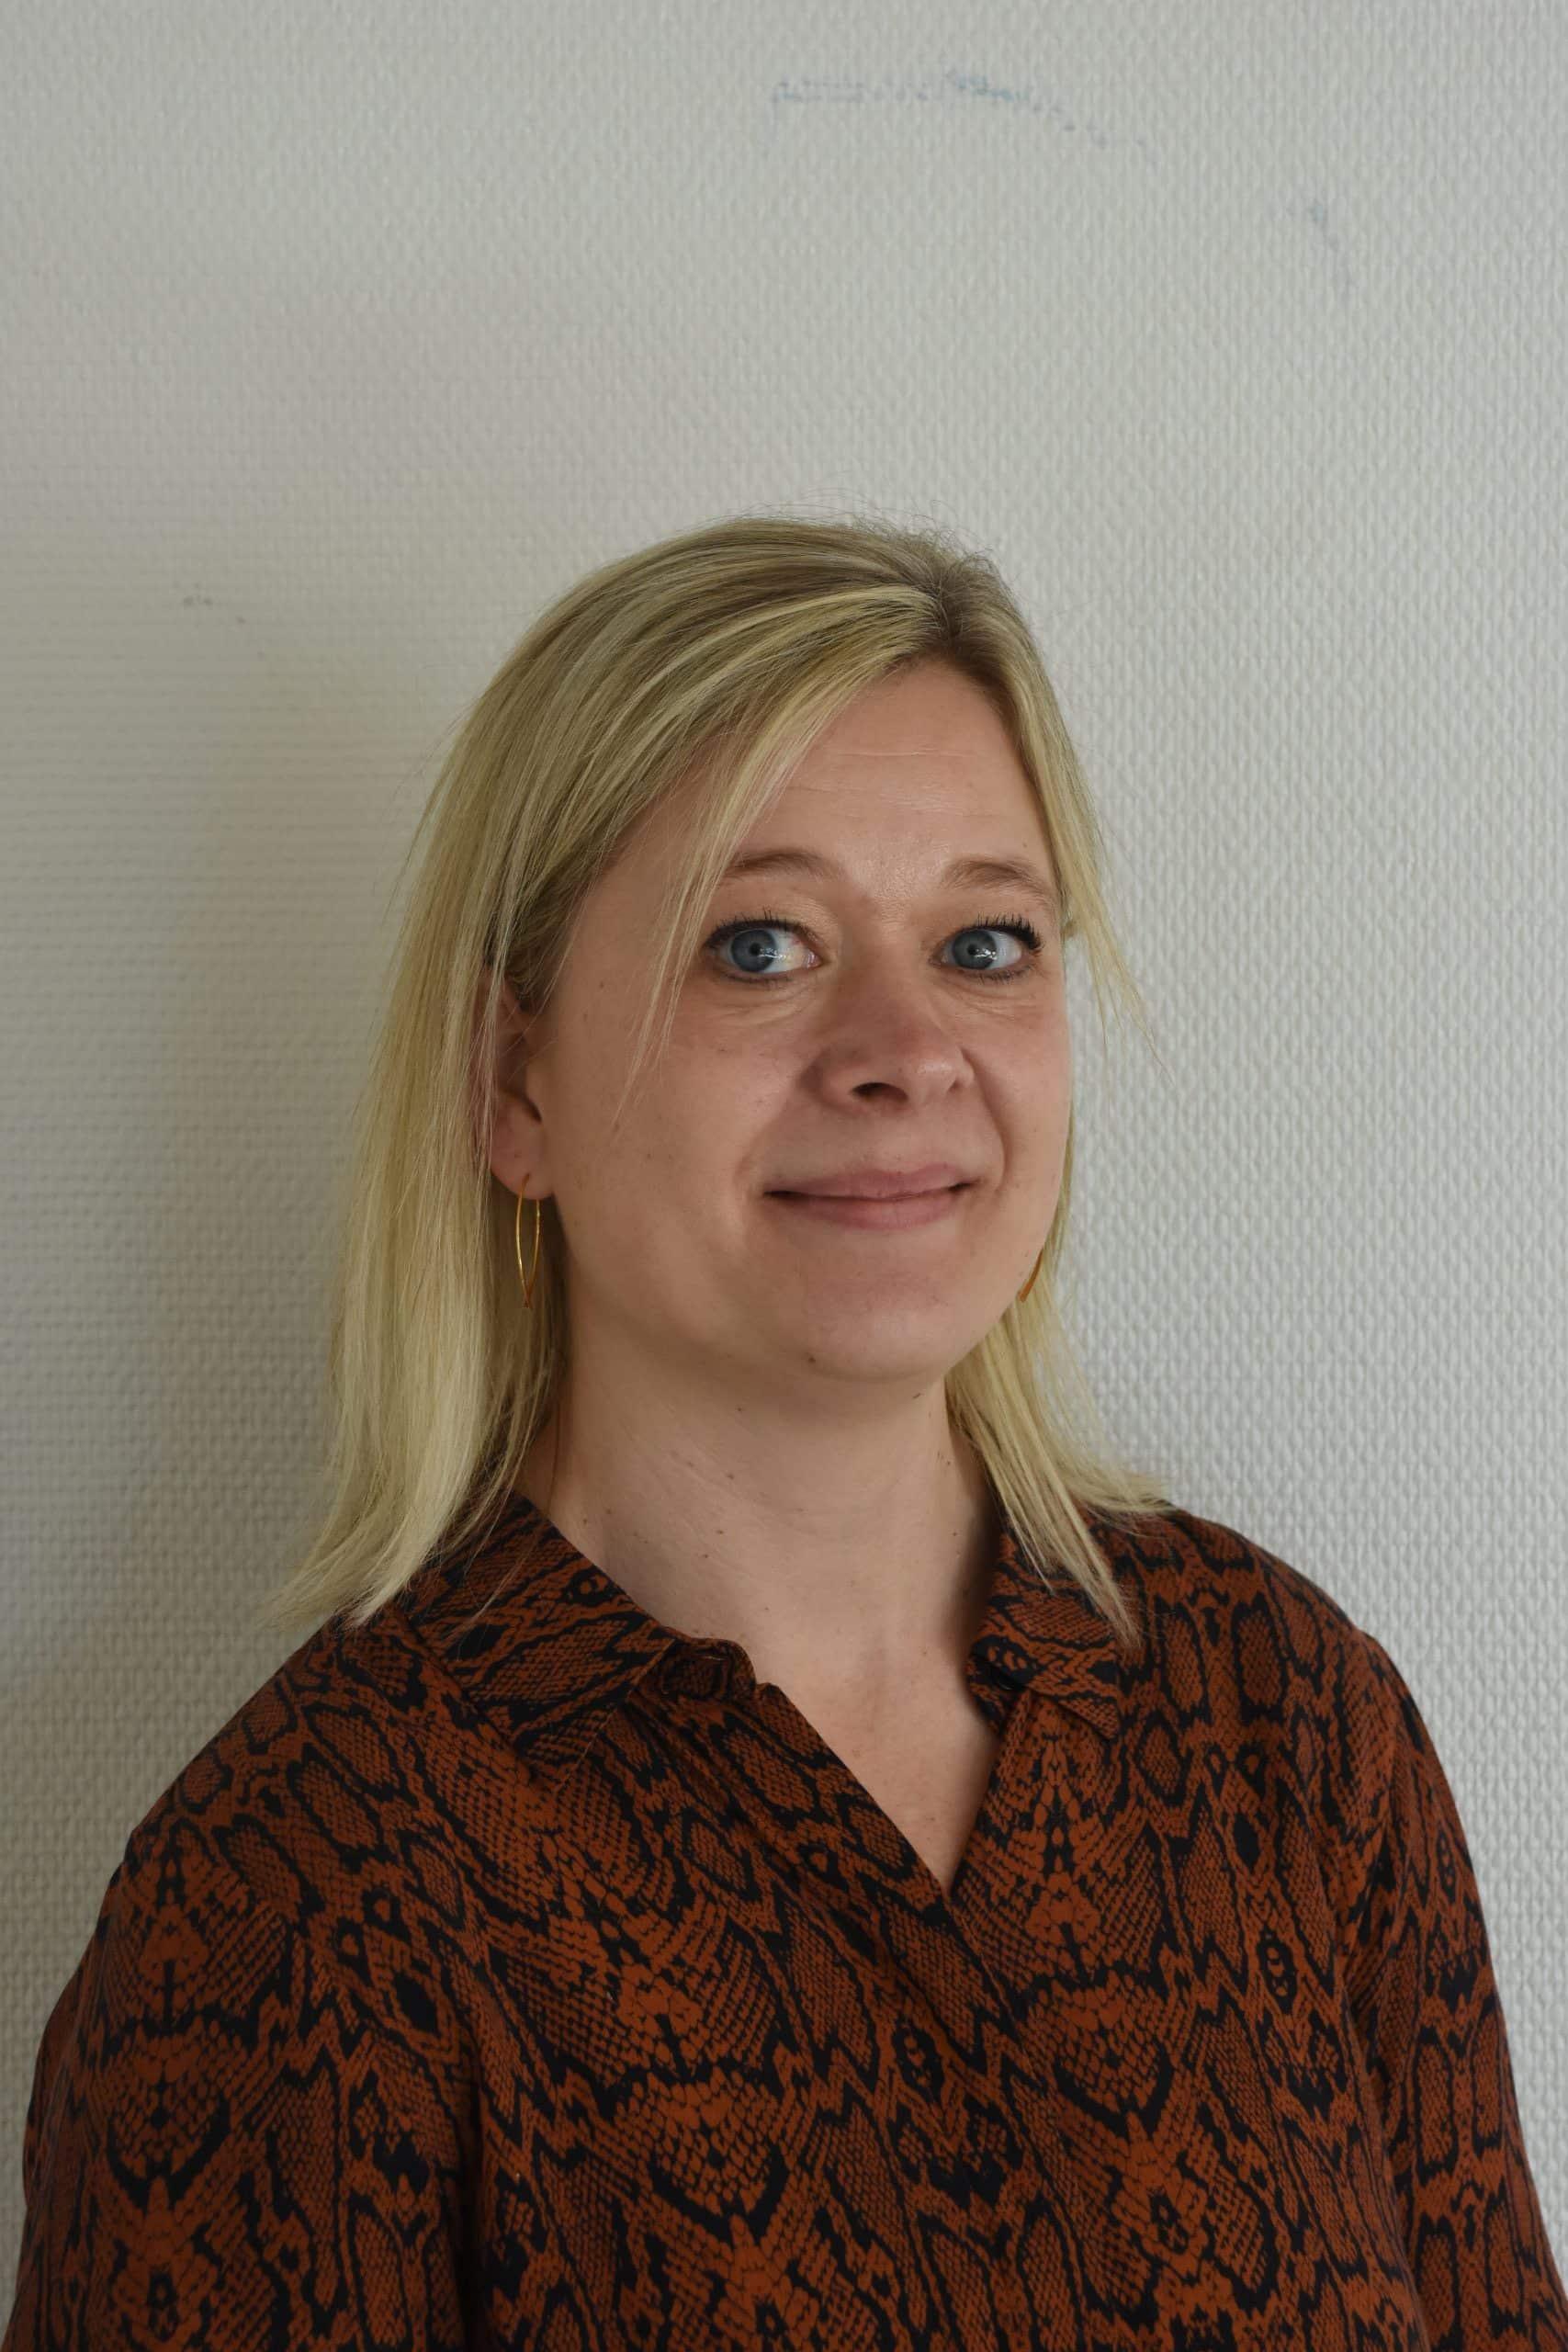 Maria Lundbak